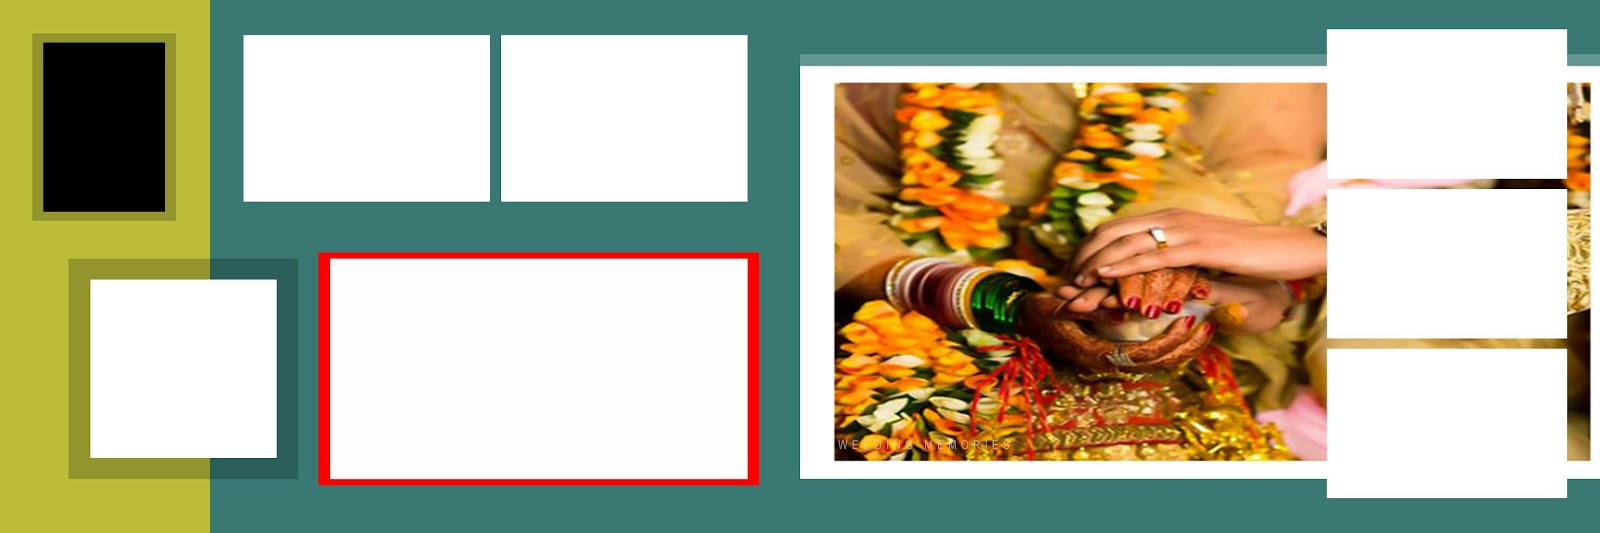 Vol 1 2019 20 Indian Karizma Album Design 12x36 Psd